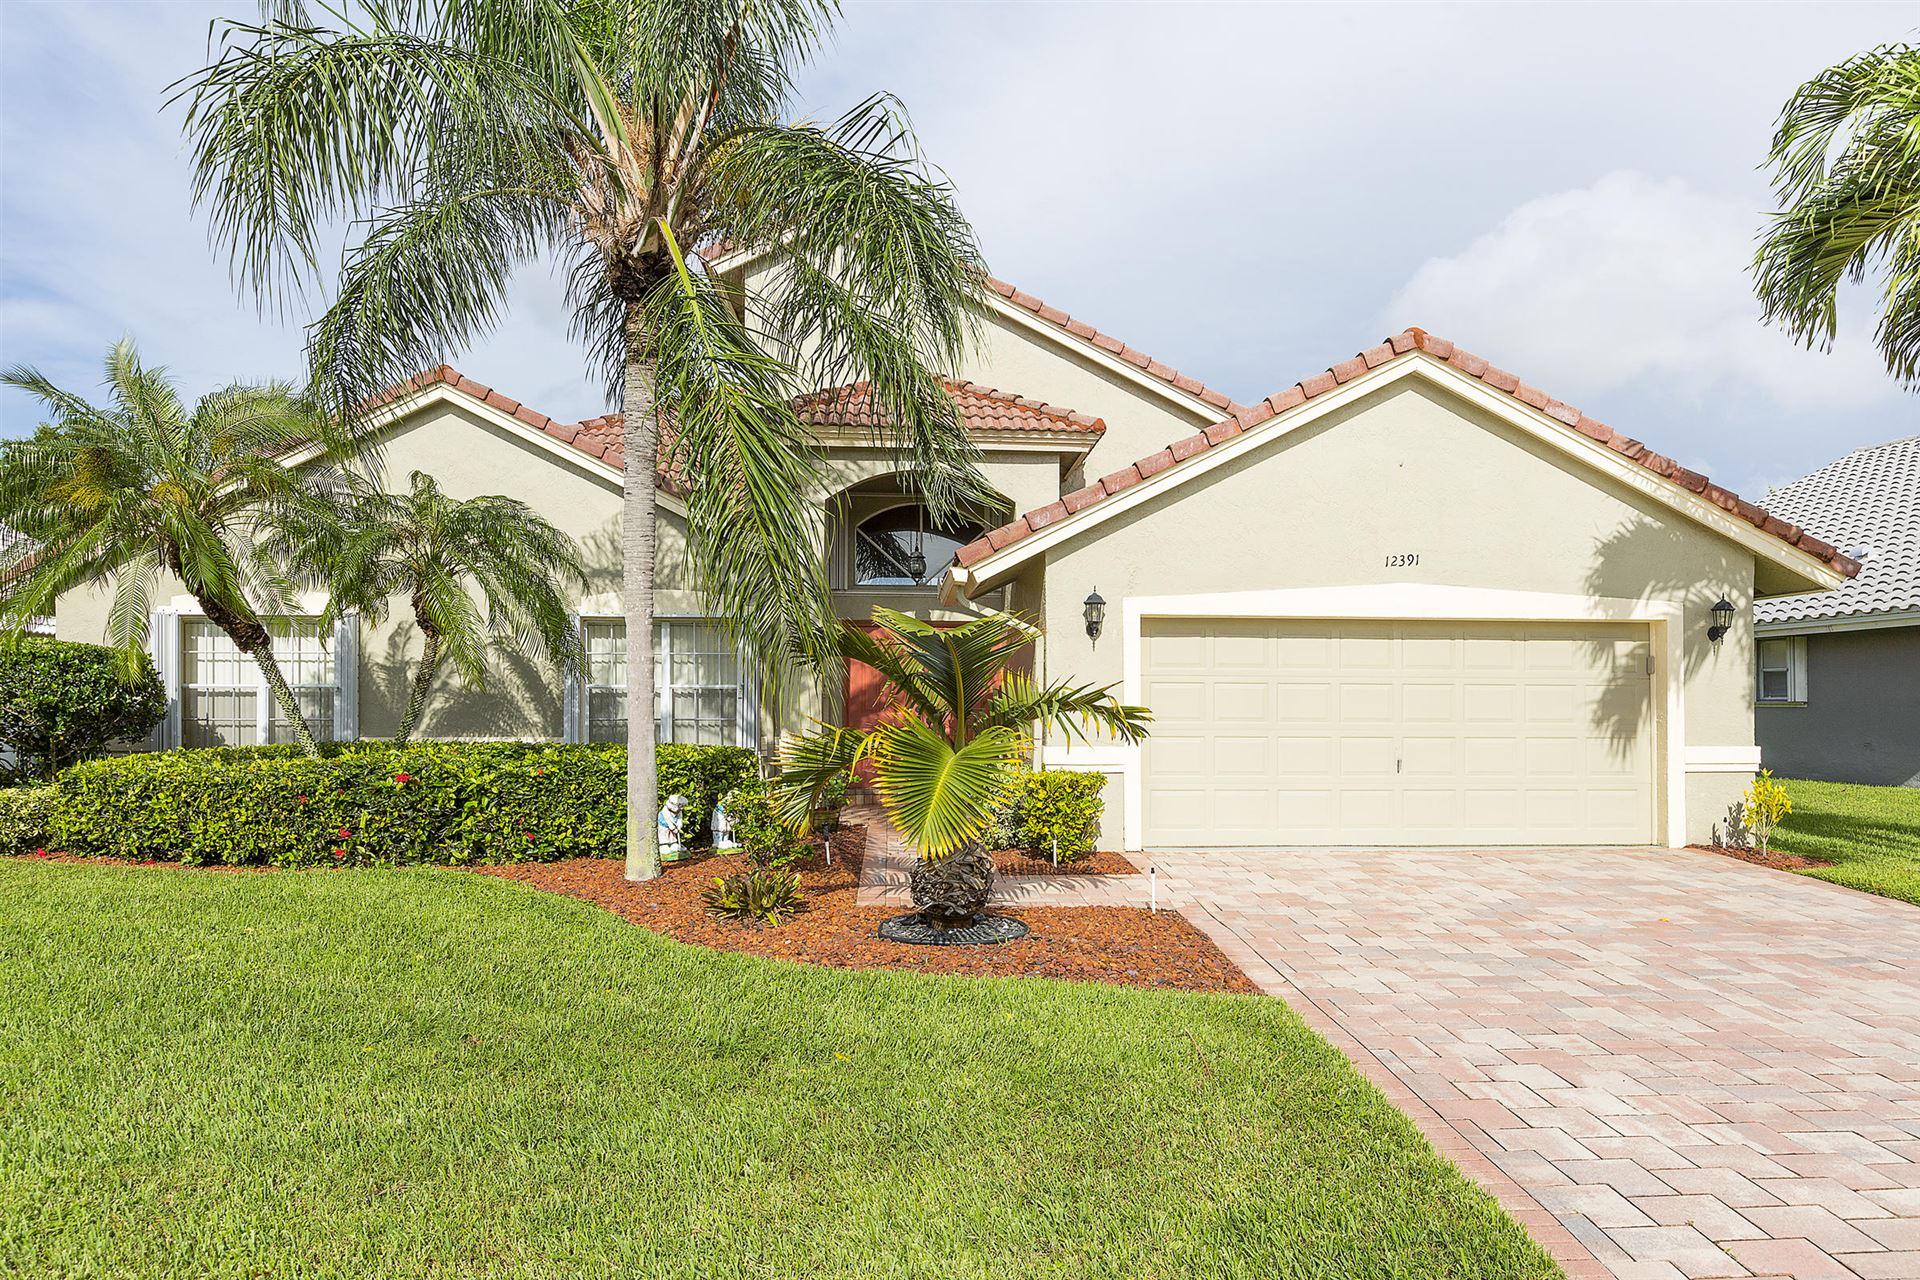 12391 Divot Drive, Boynton Beach, FL 33437 - #: RX-10672667